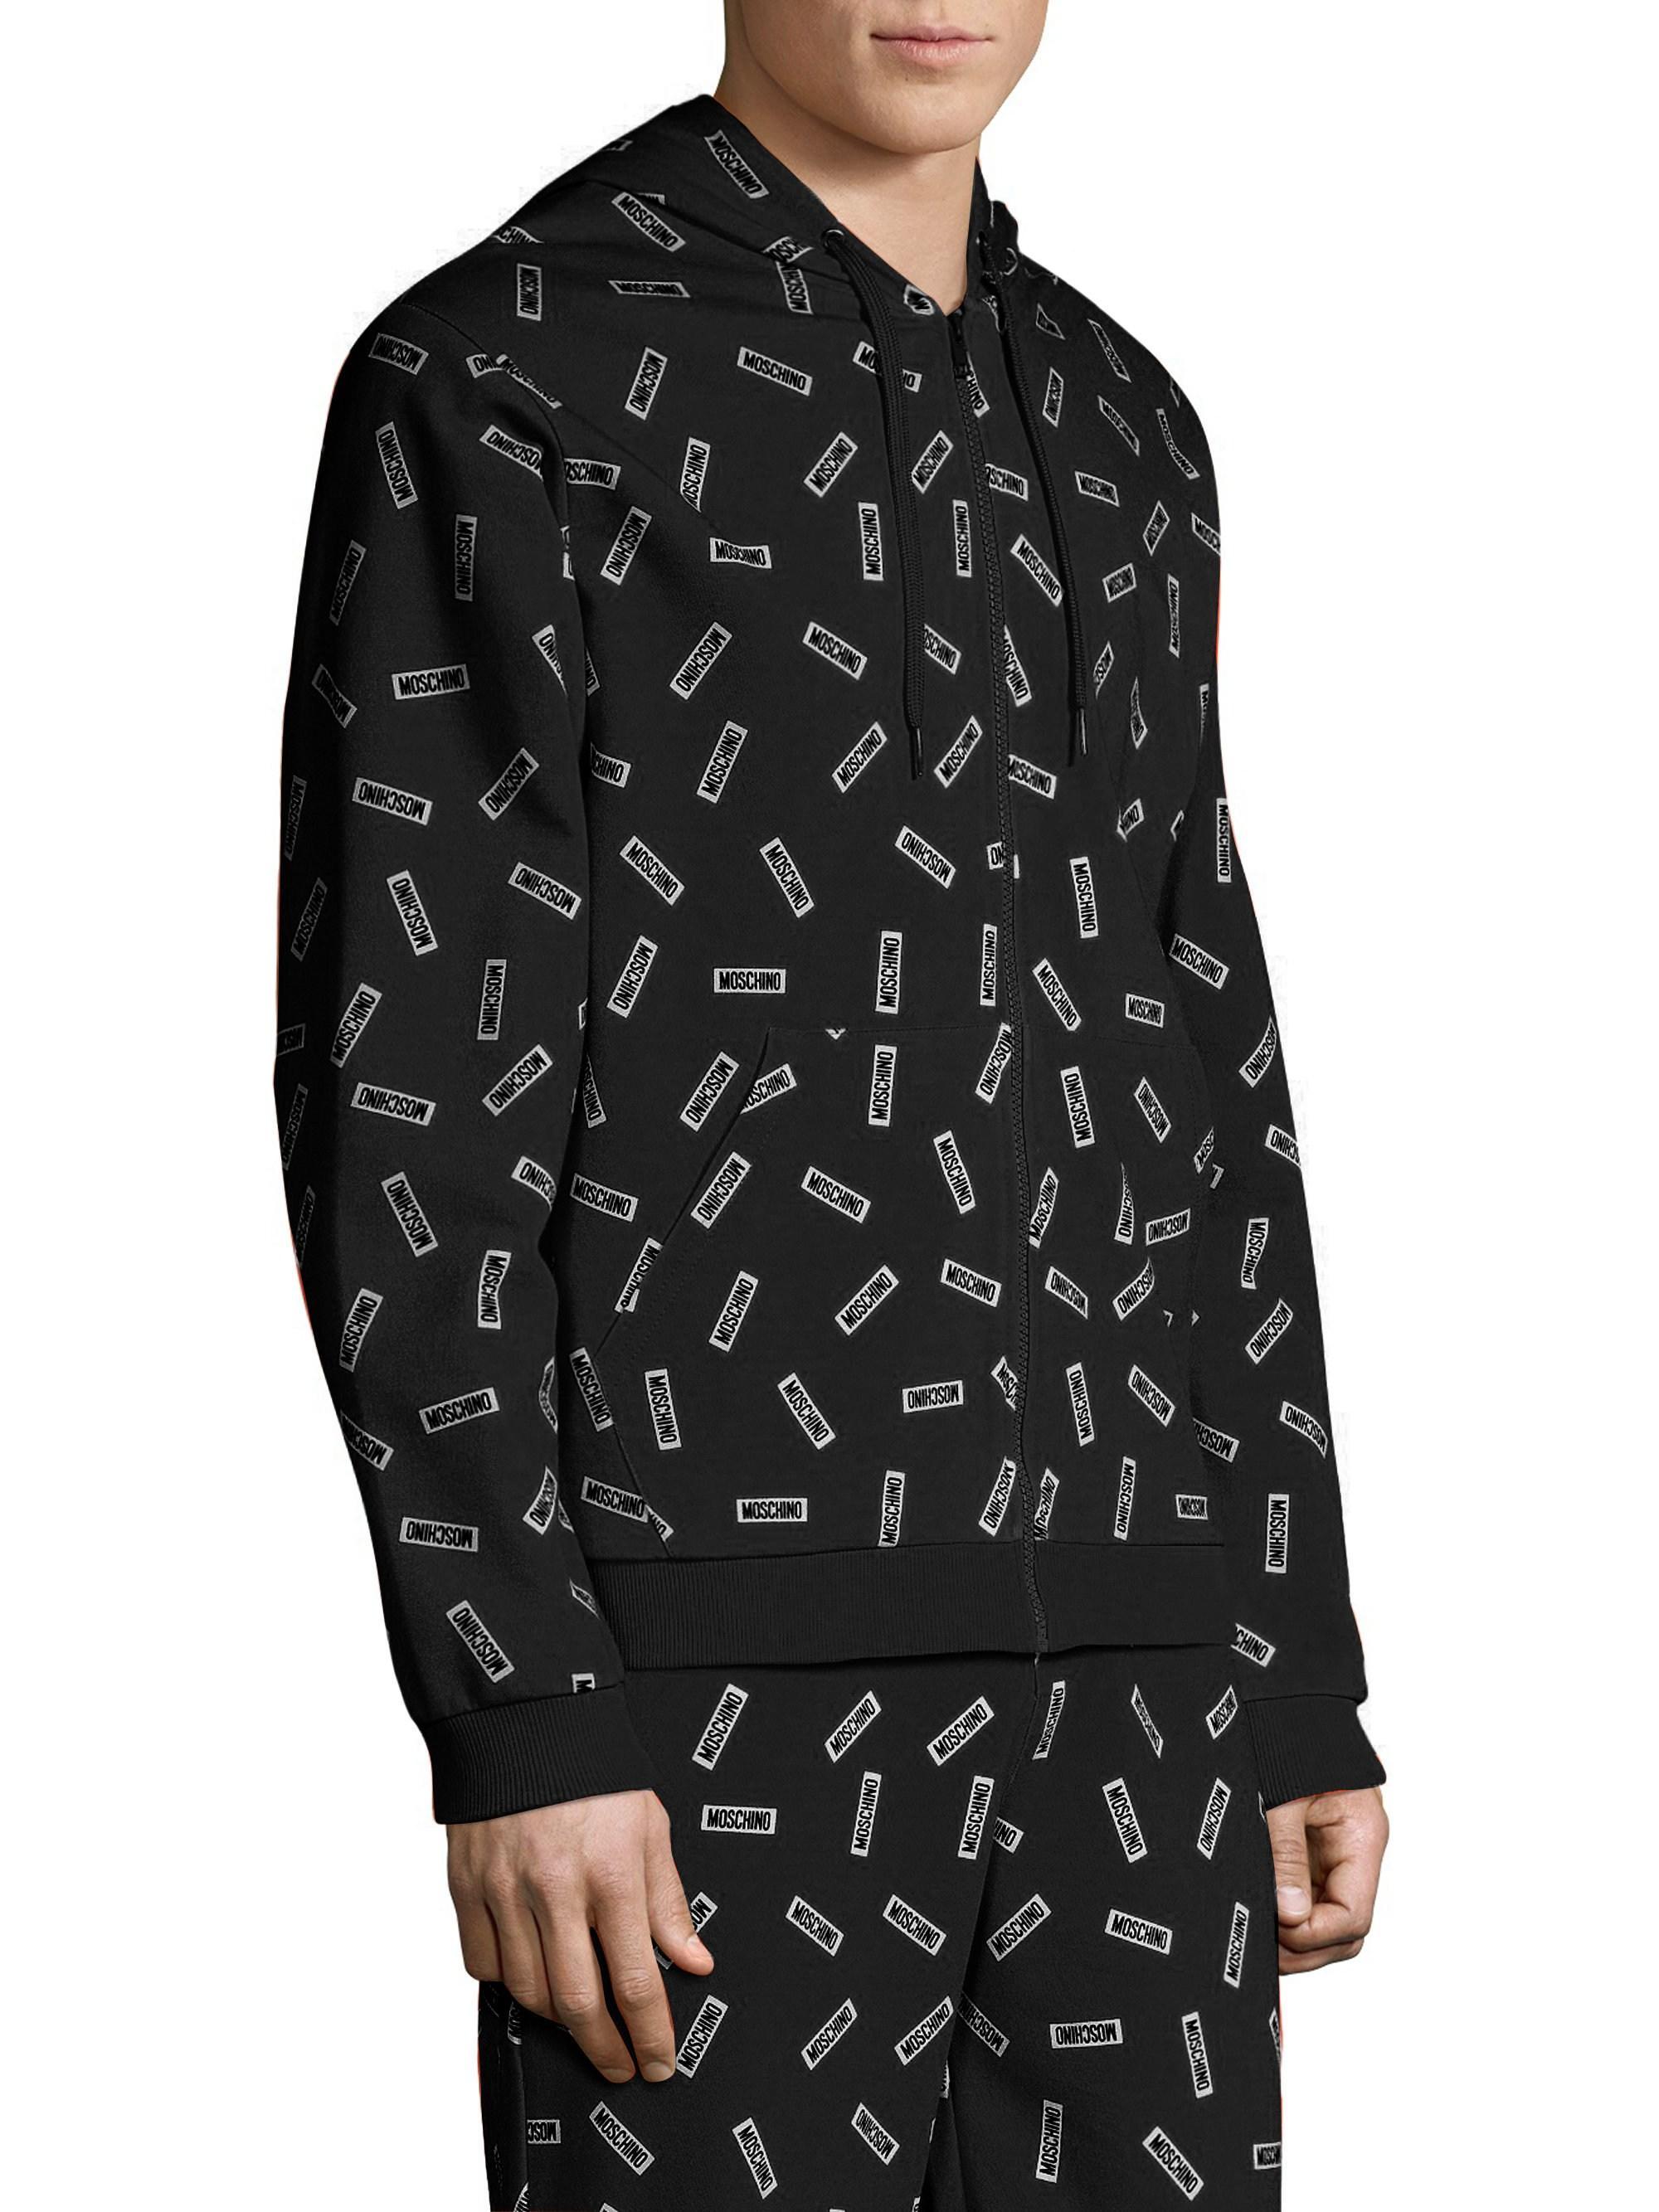 d13ca0cb Moschino Men's Allover Tag Cotton Hoodie - Orange Multi - Size Xl in Black  for Men - Lyst